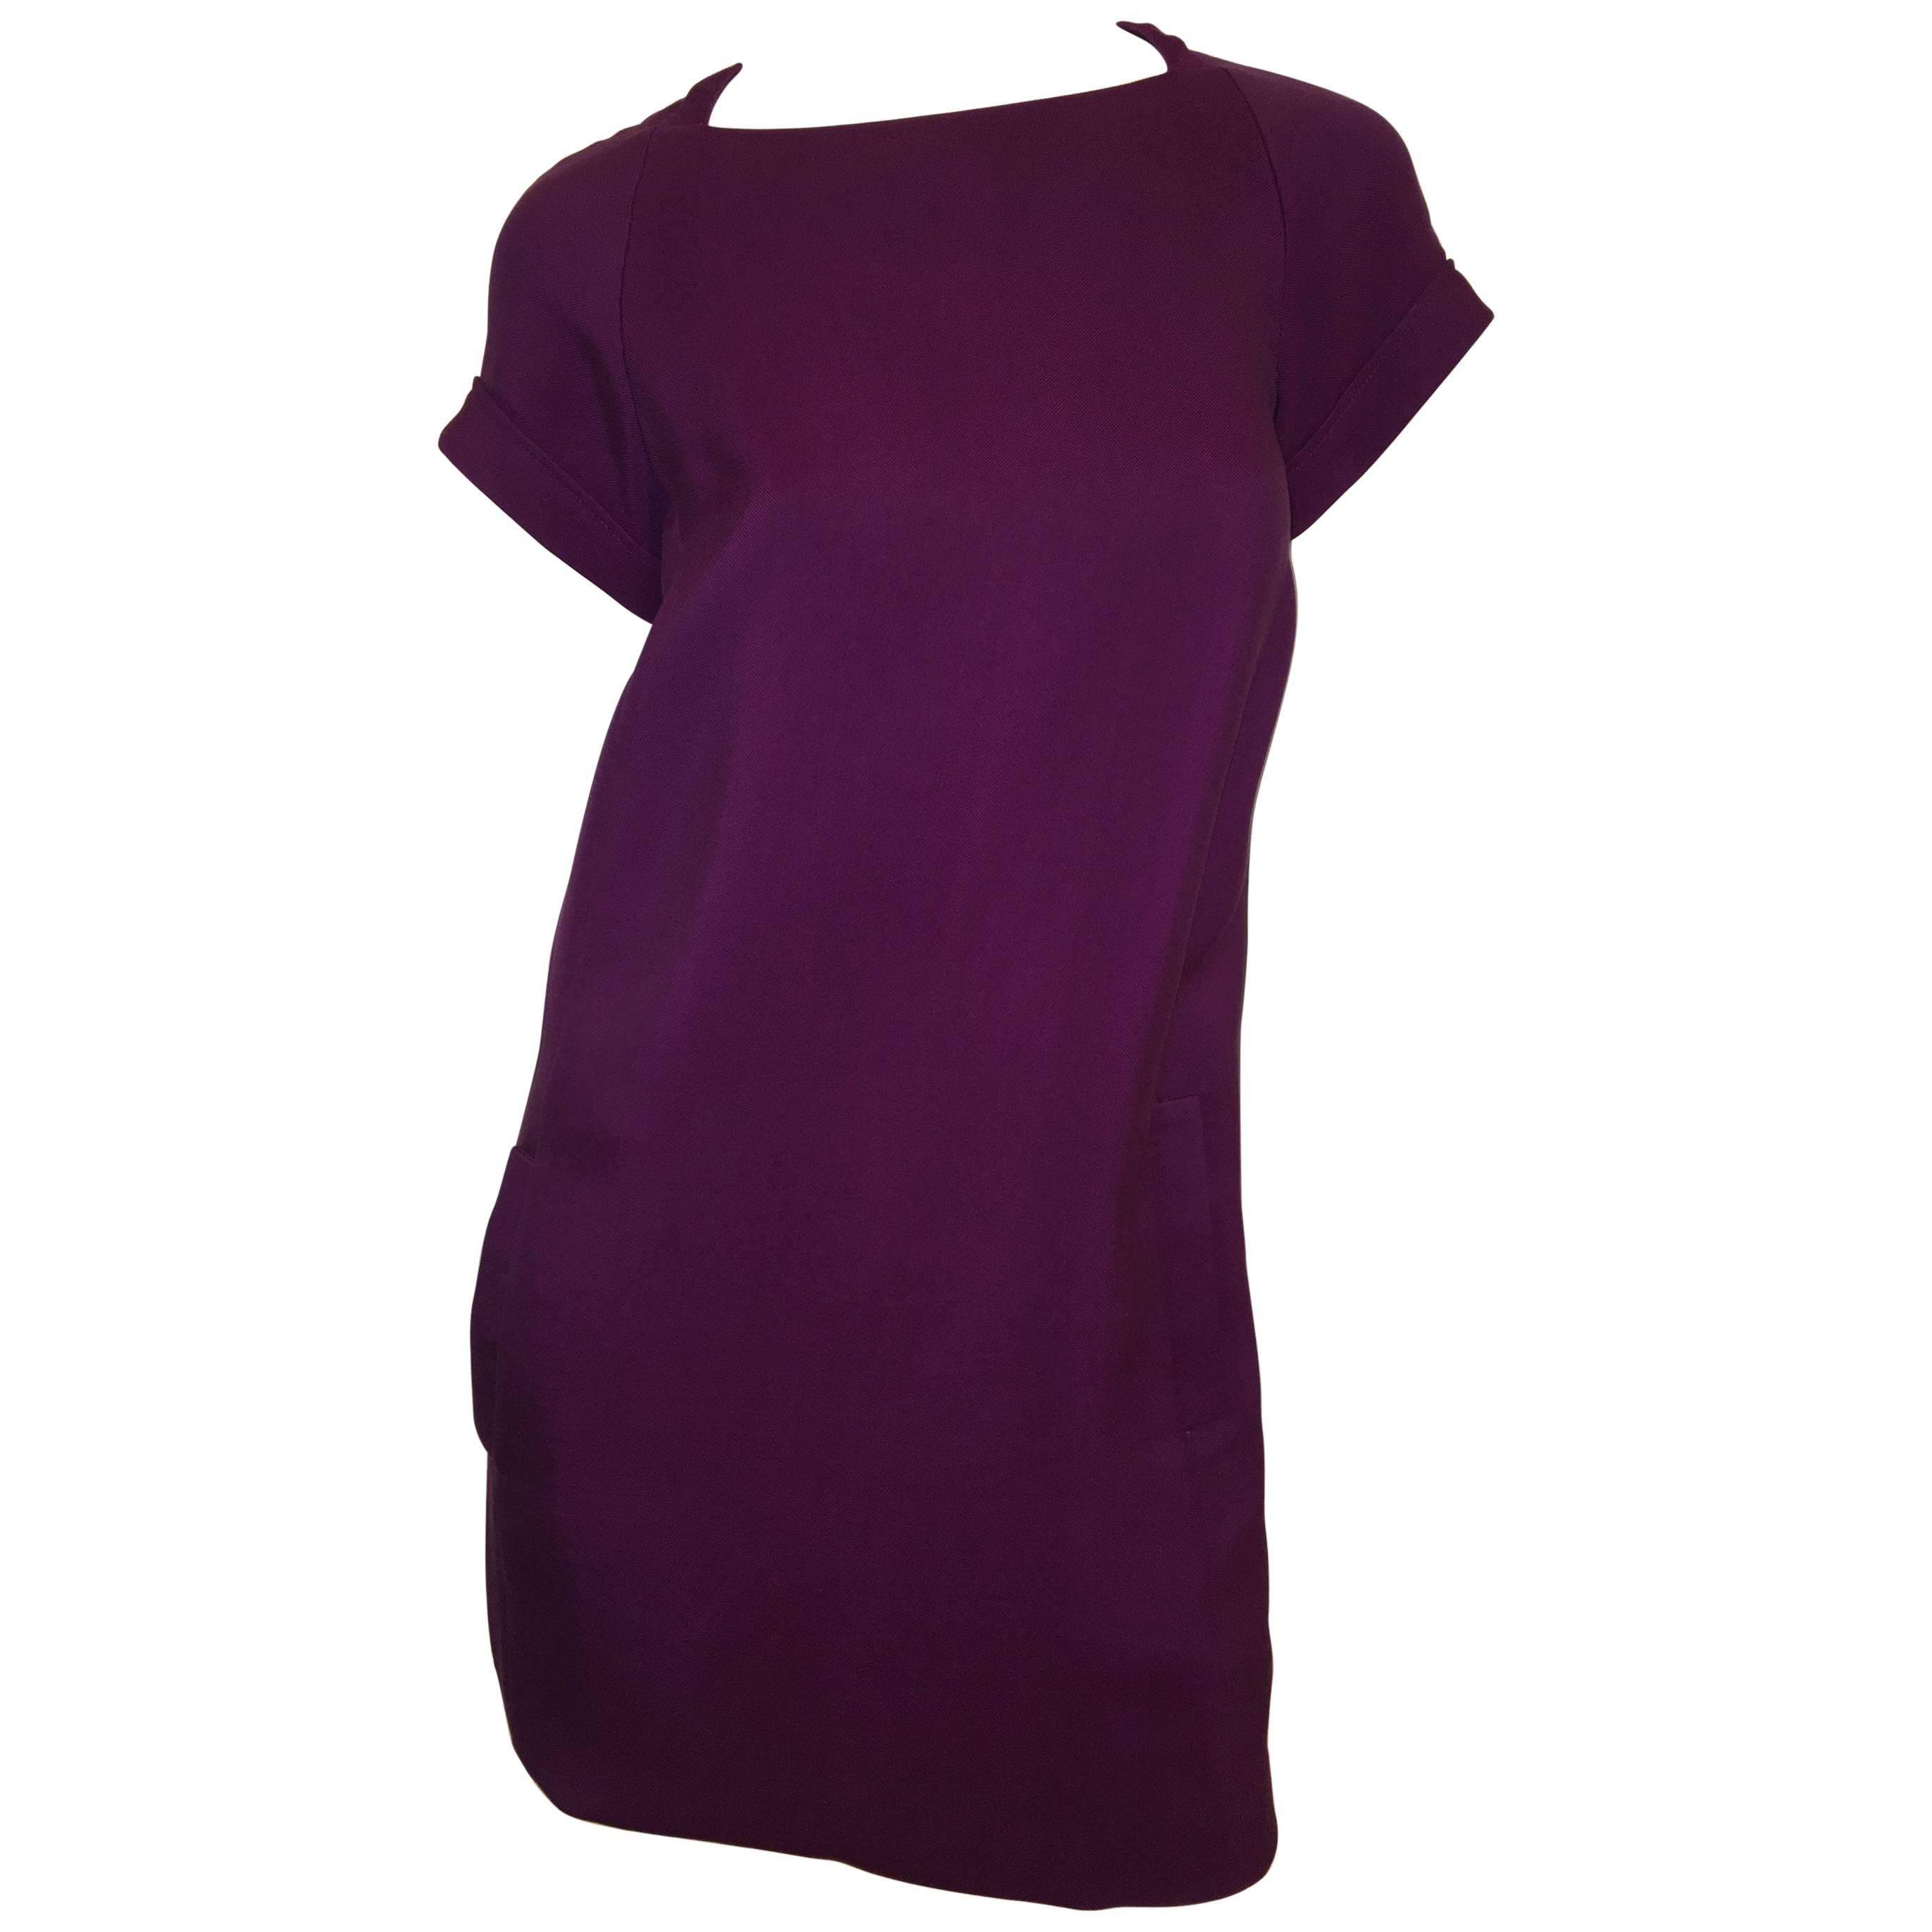 Derek Lam Plum Dress